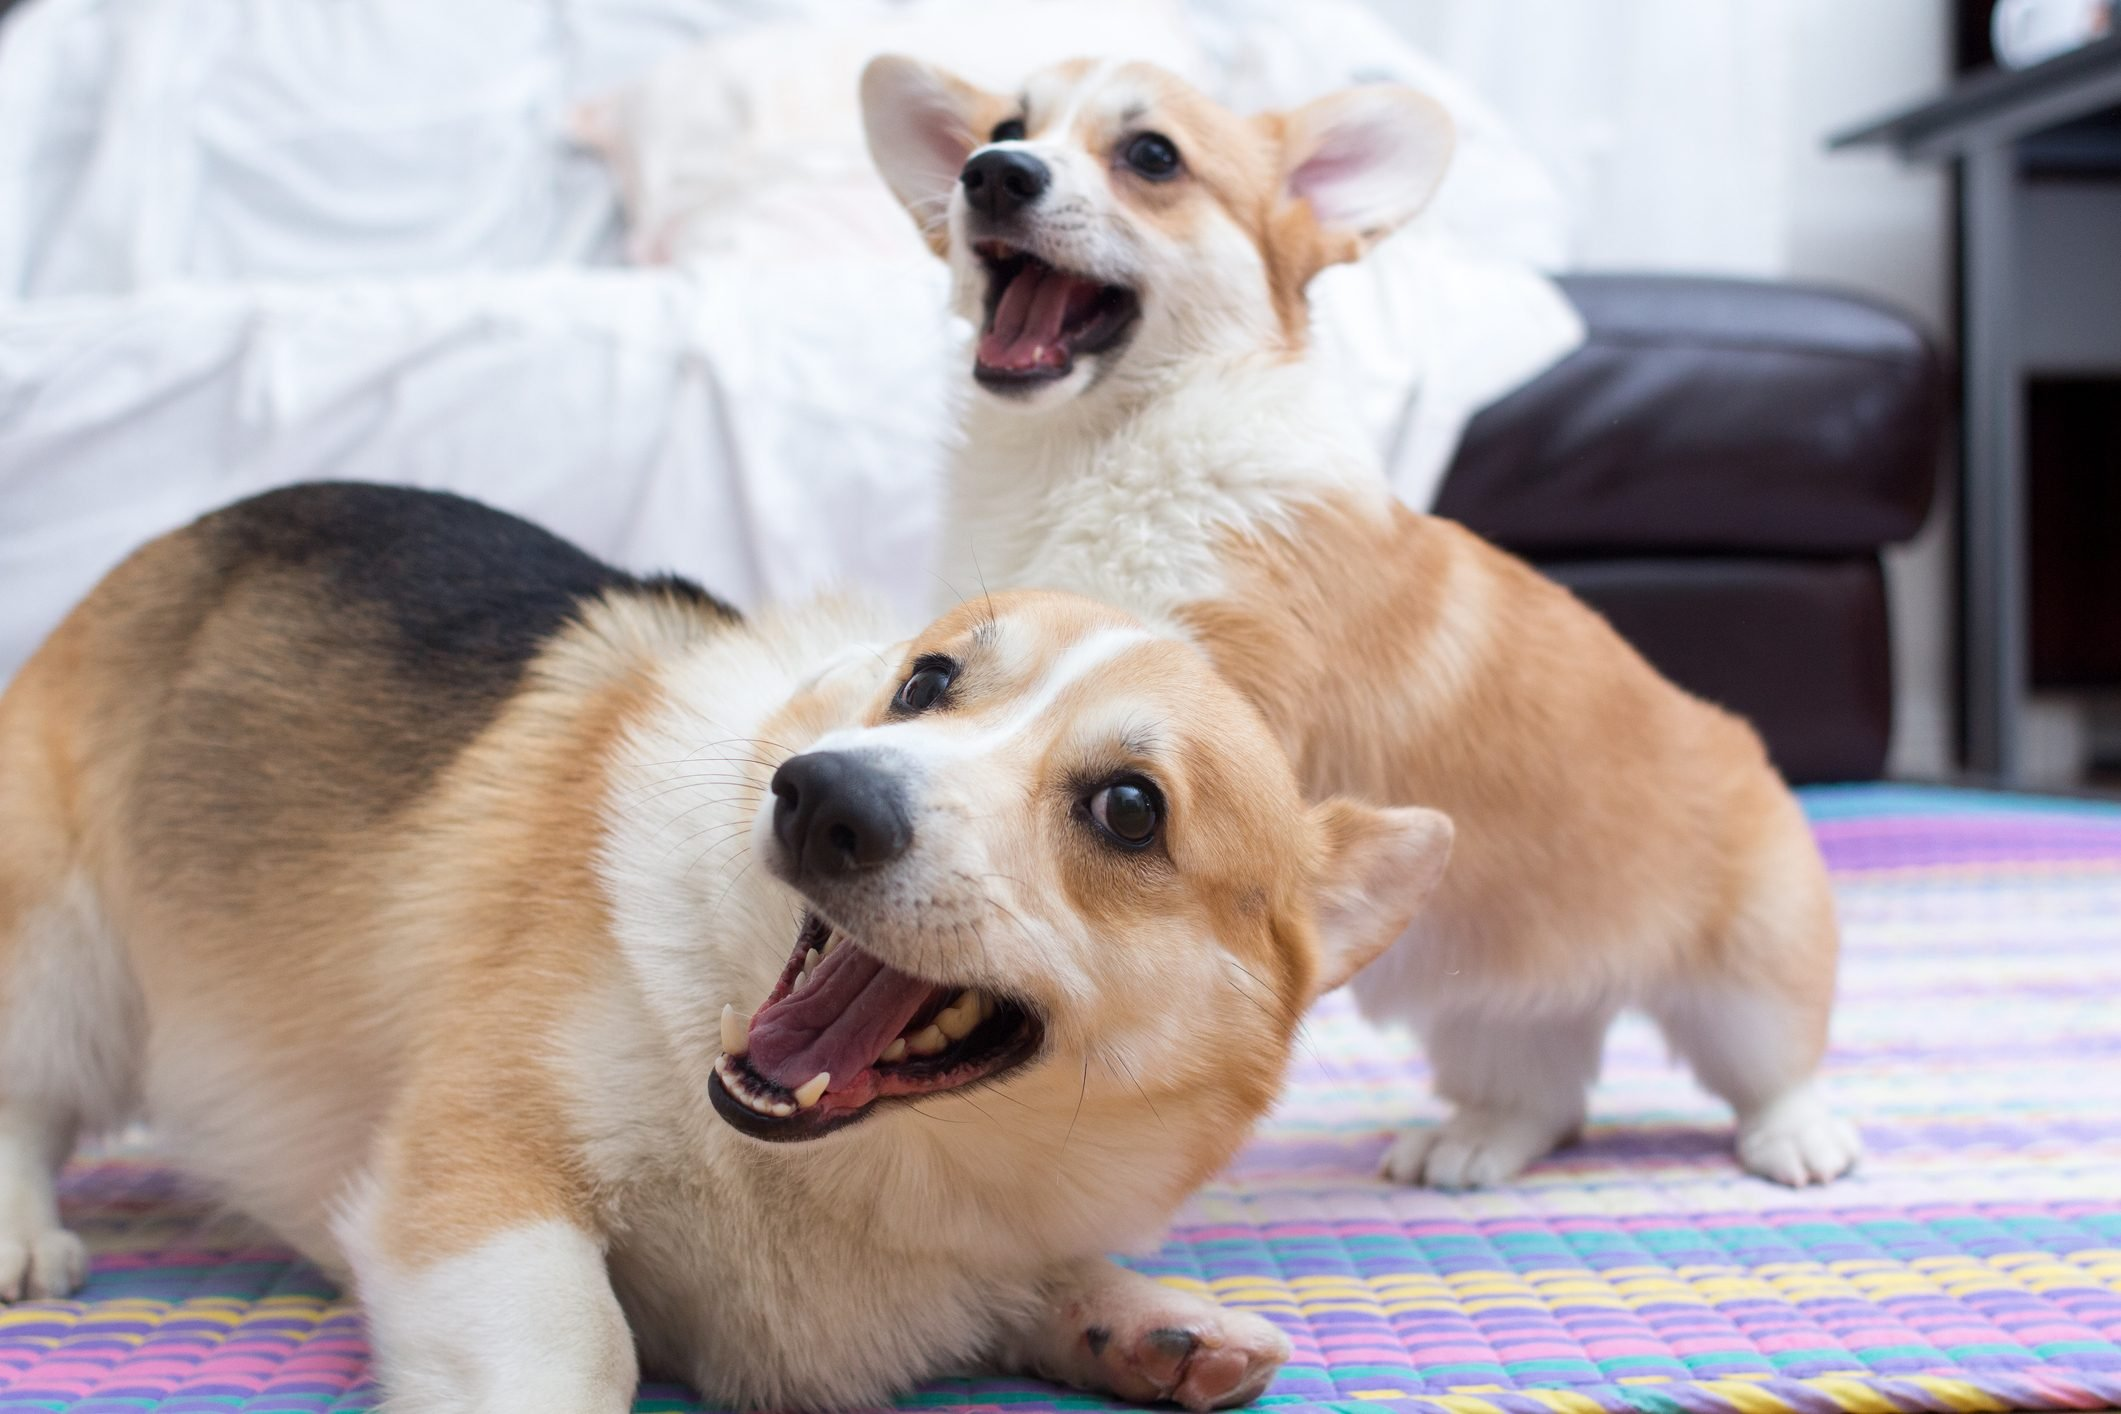 Adult corgi and corgi puppy playing